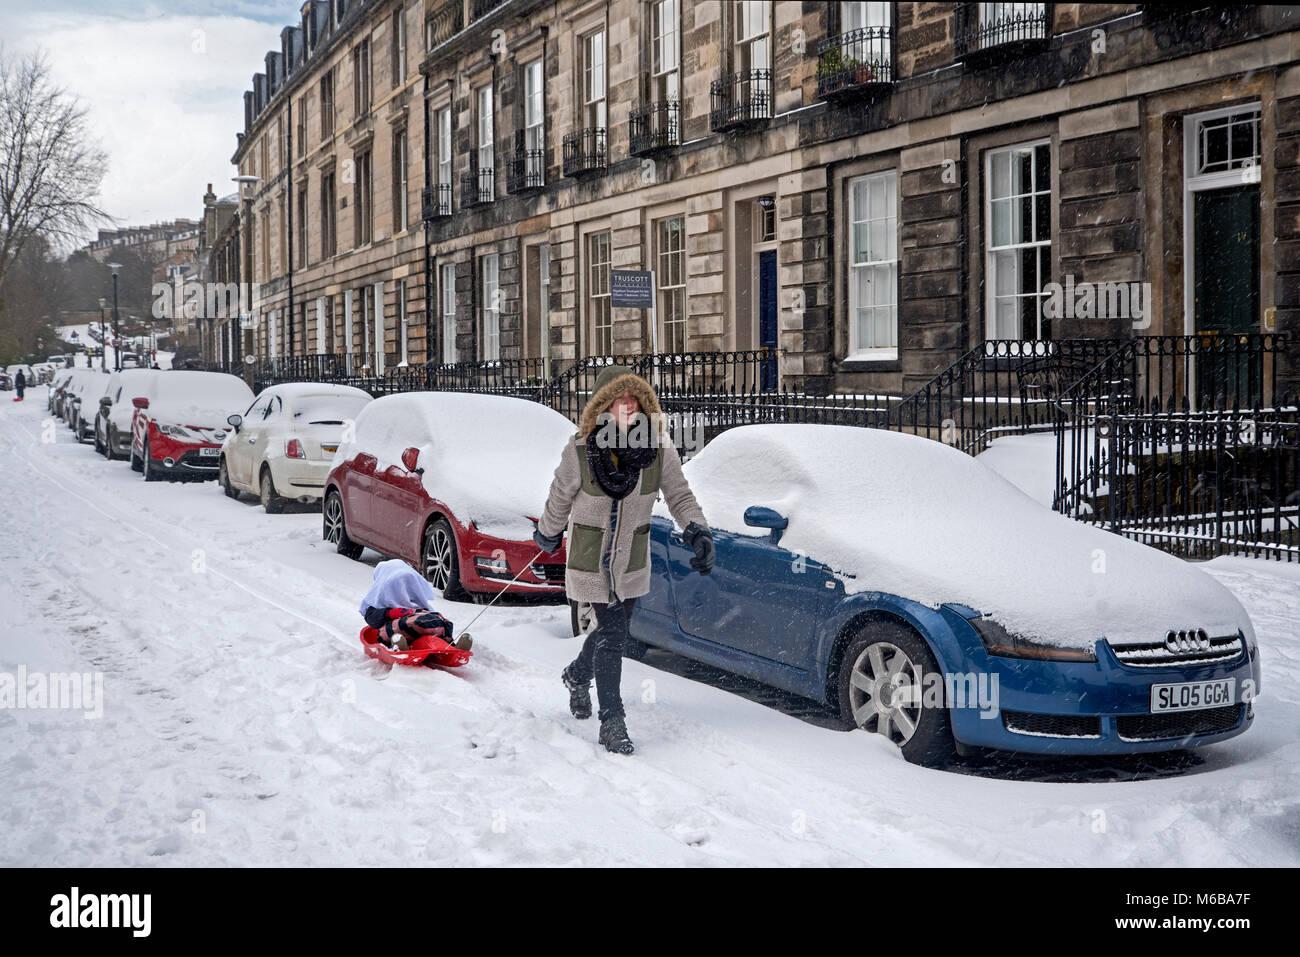 A woman pulling a child on a sledge through the snow in Stockbridge, Edinburgh. - Stock Image